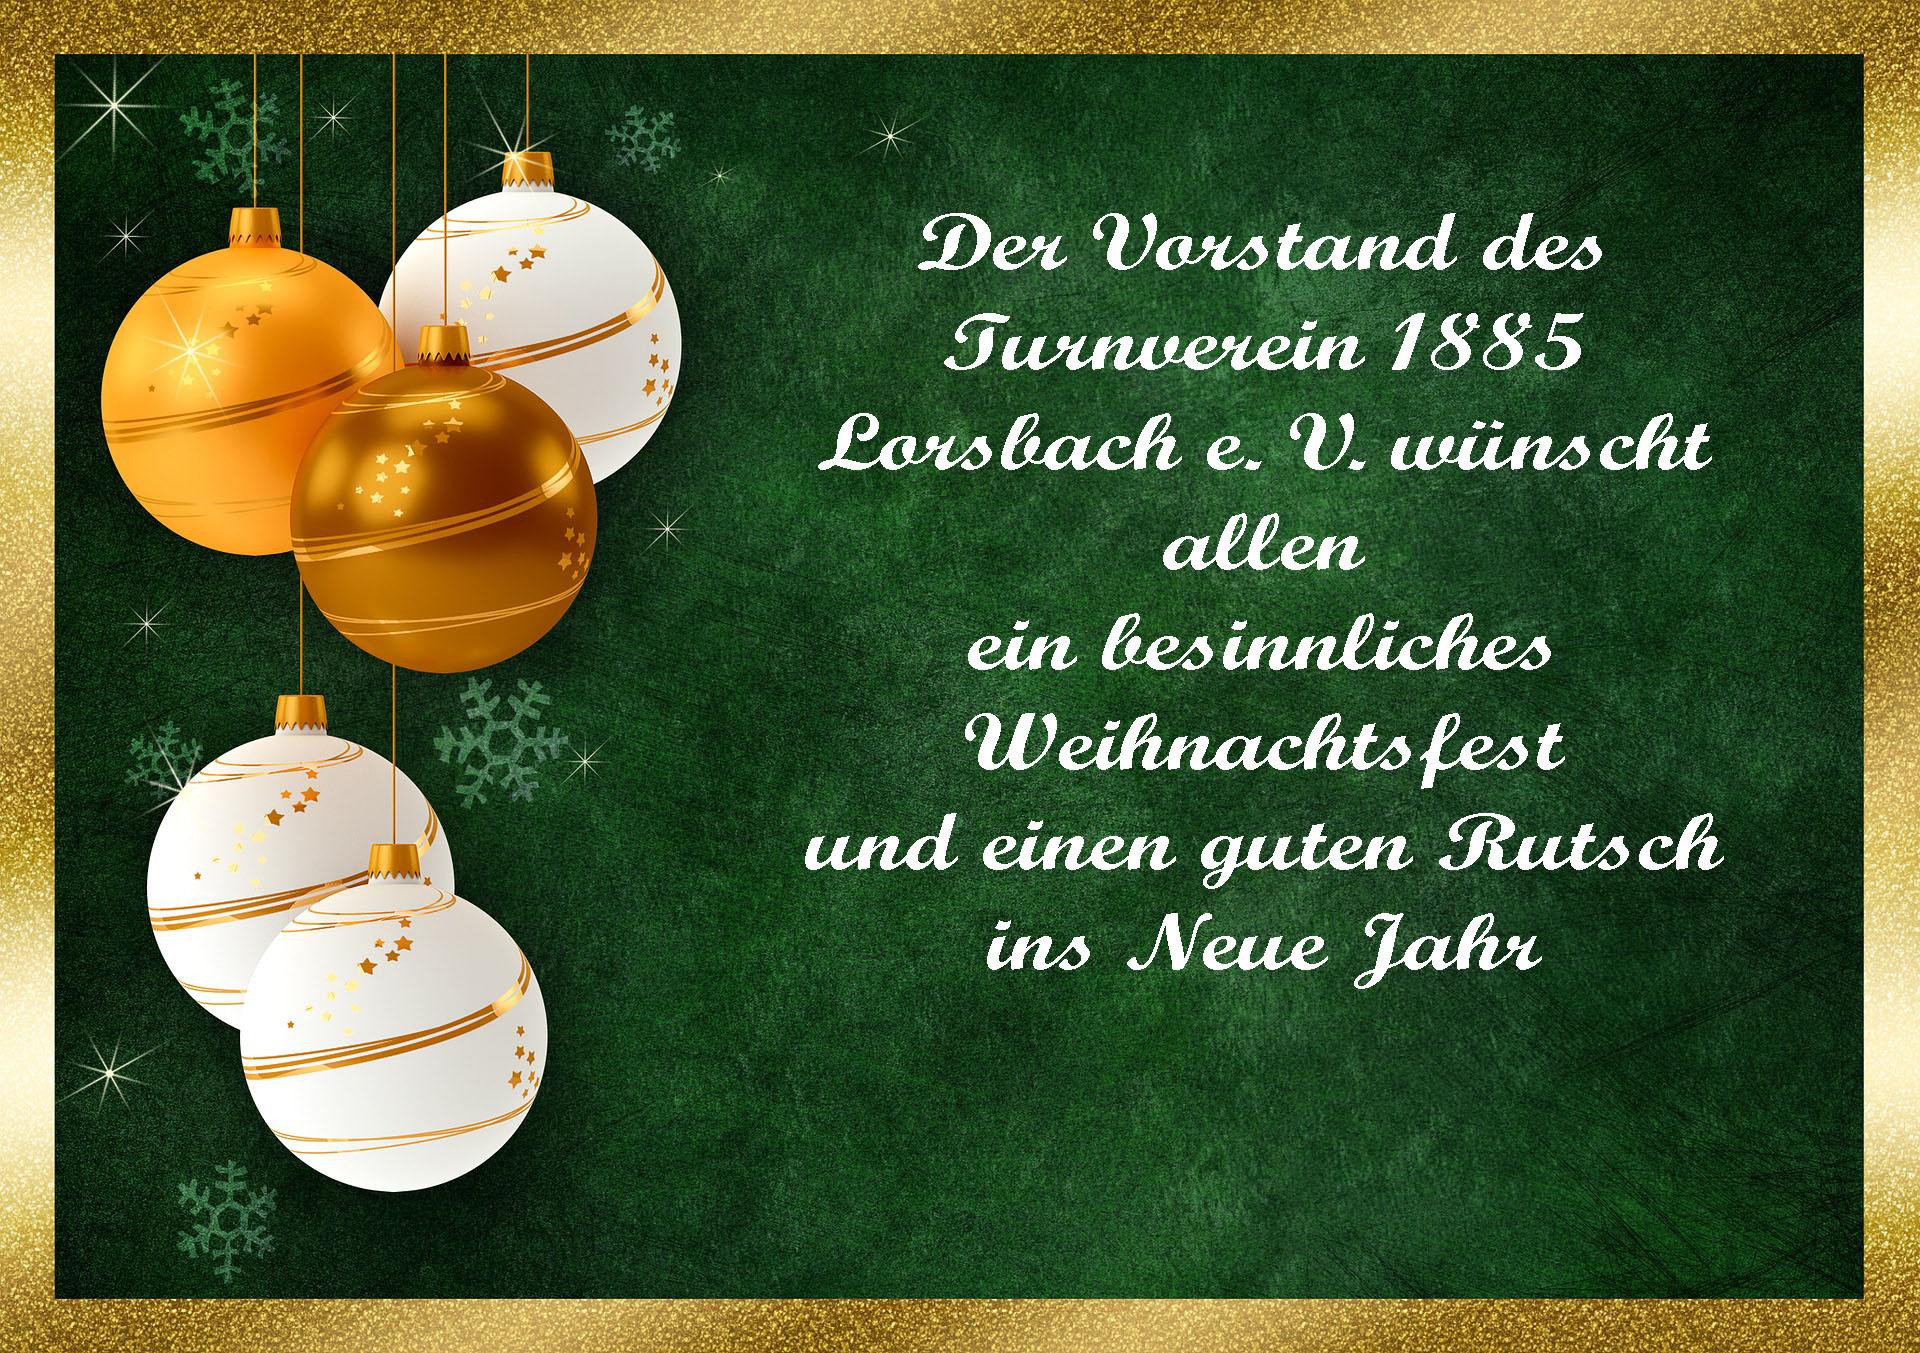 TVL-Weihnachtsgruss